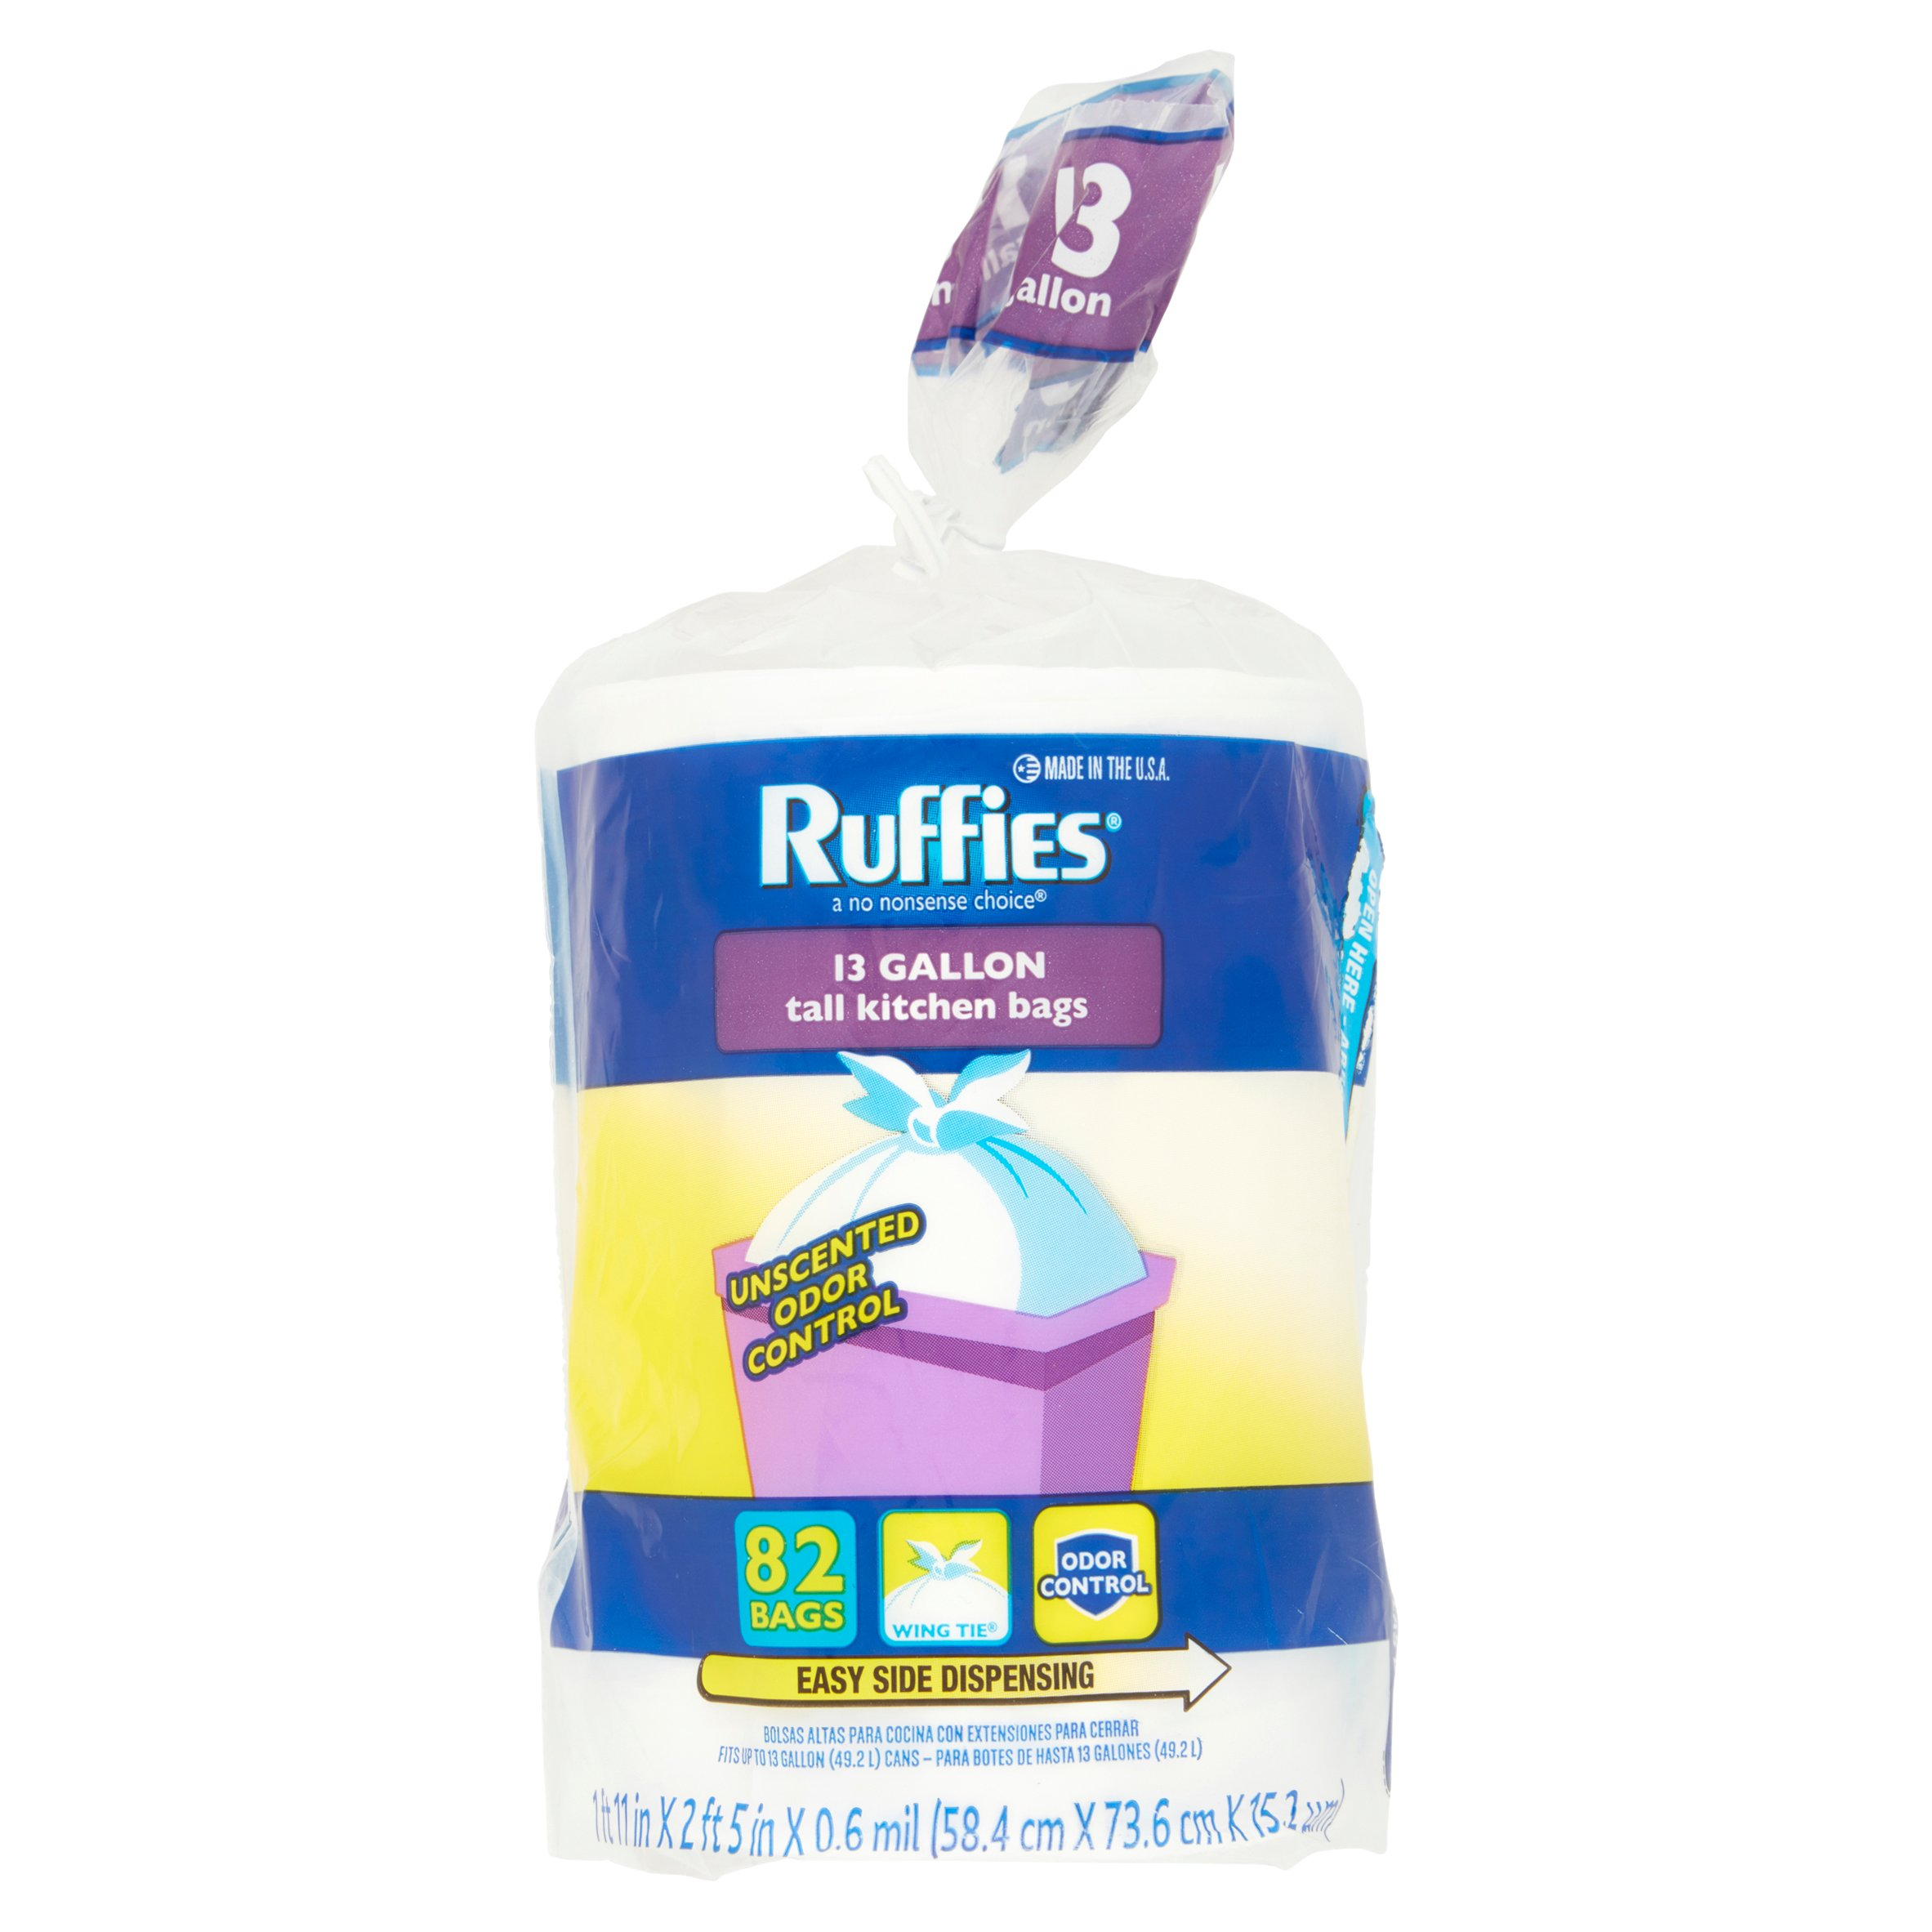 Ruffies Tall Kitchen Trash Bags, 13 Gallon, 82 Ct - Walmart.com